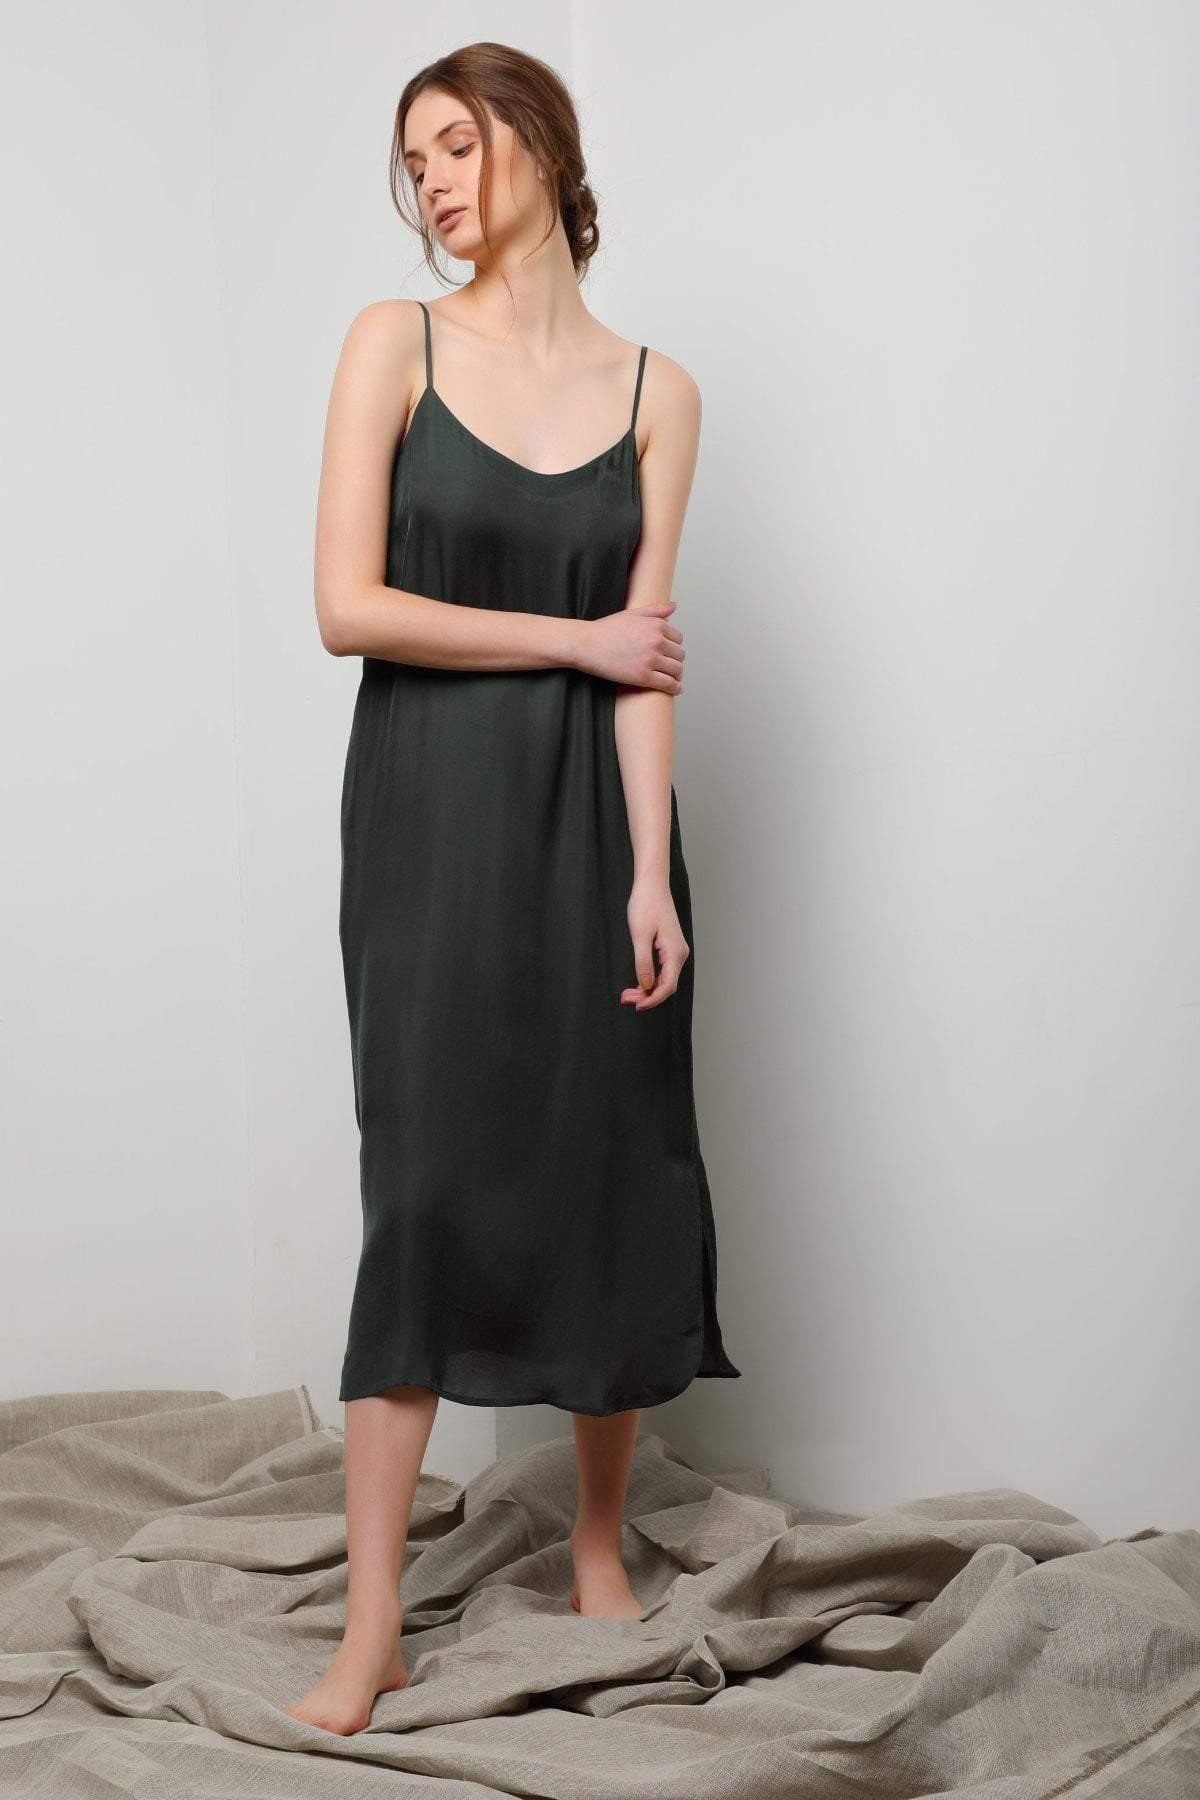 Easy Slip Dress, $125 @neunomads.com